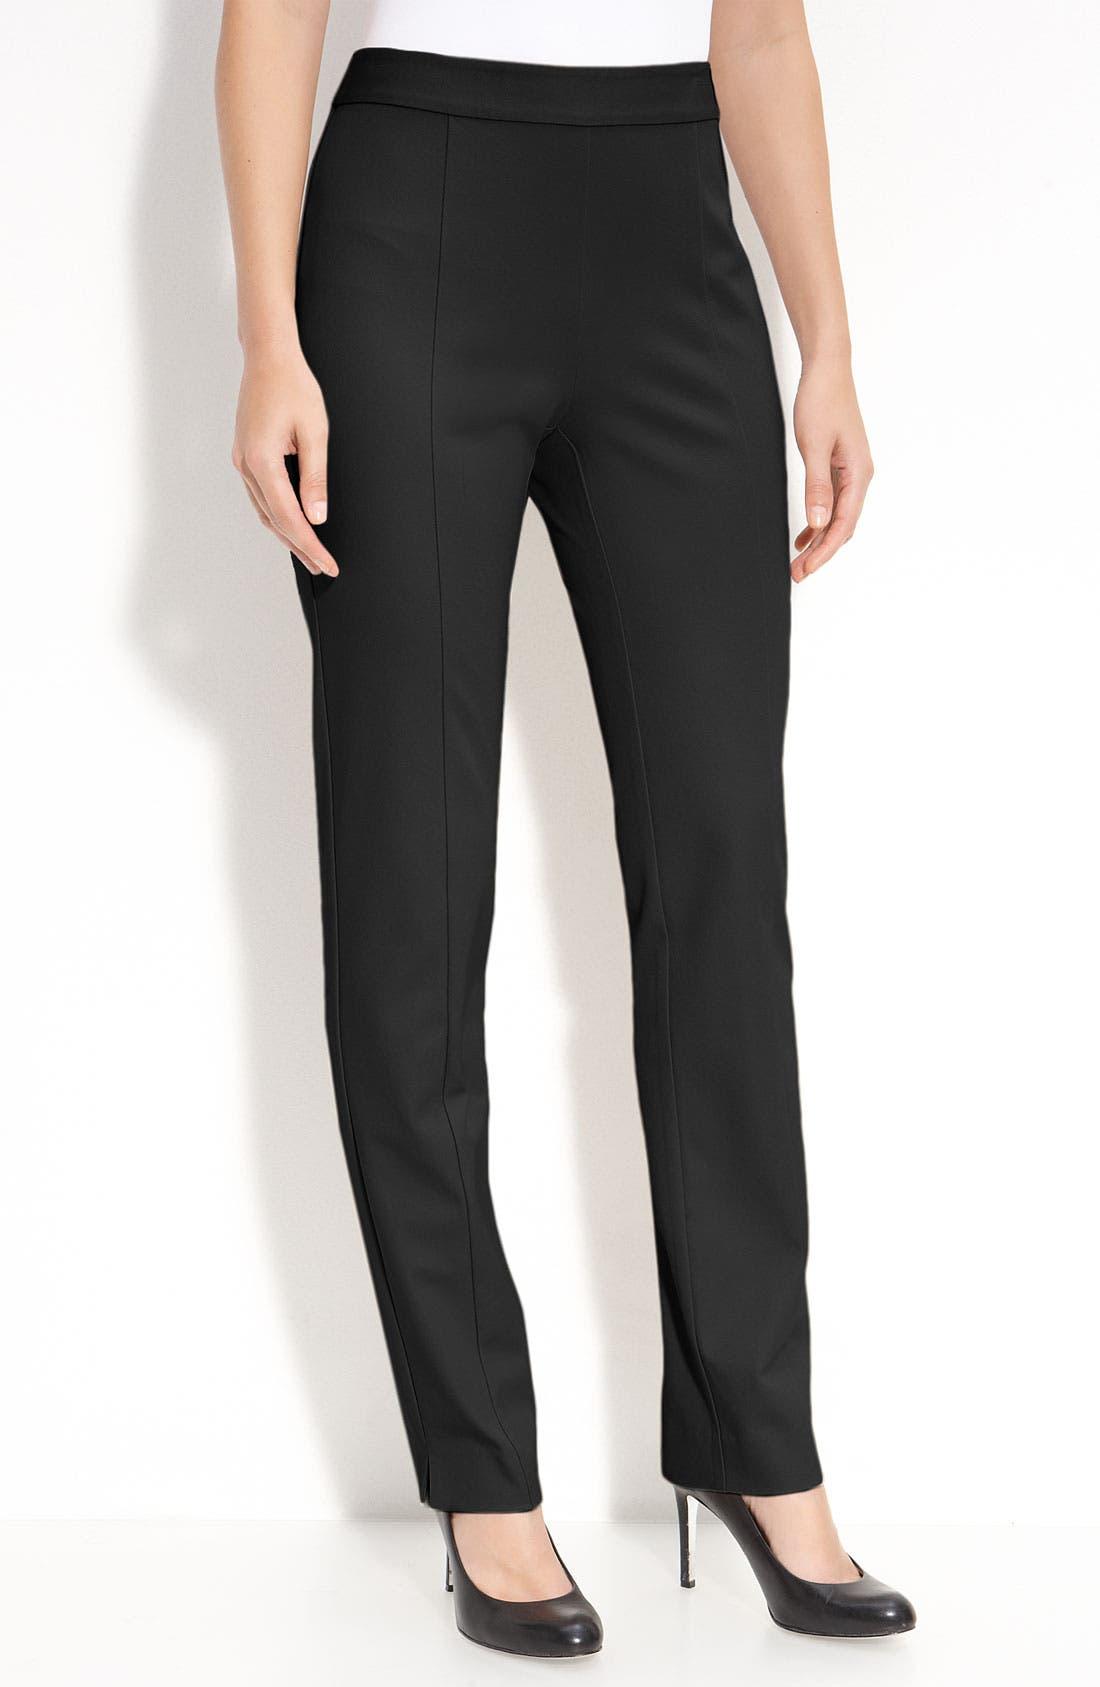 Alternate Image 1 Selected - Gallia Moda Stretch Cotton Pants